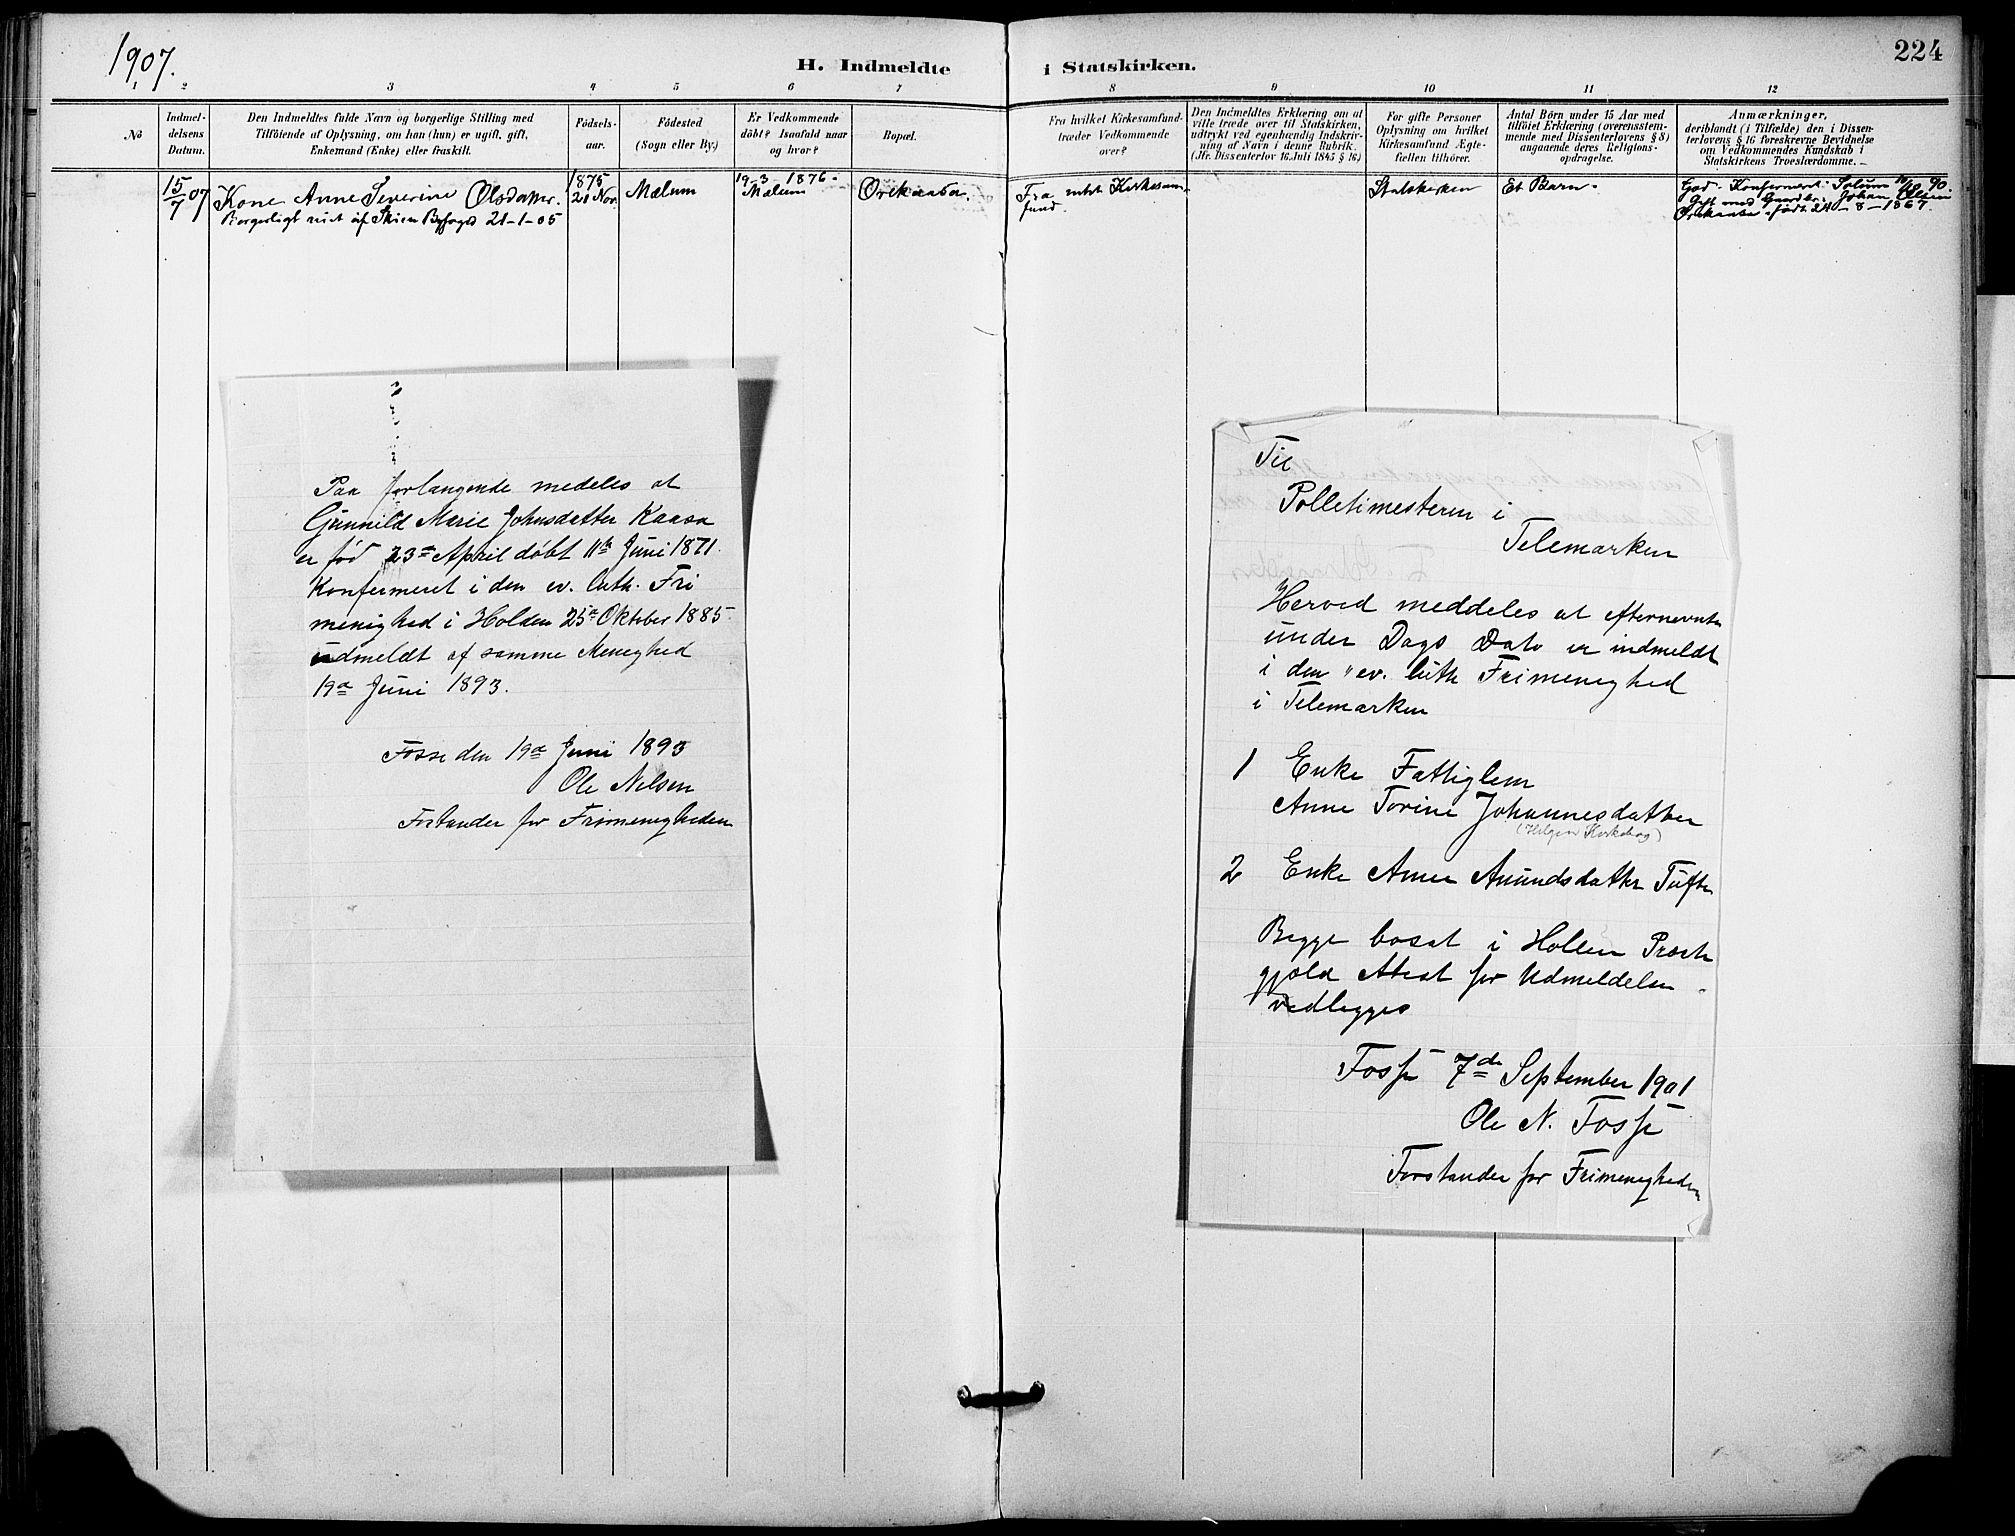 SAKO, Holla kirkebøker, F/Fa/L0010: Ministerialbok nr. 10, 1897-1907, s. 224